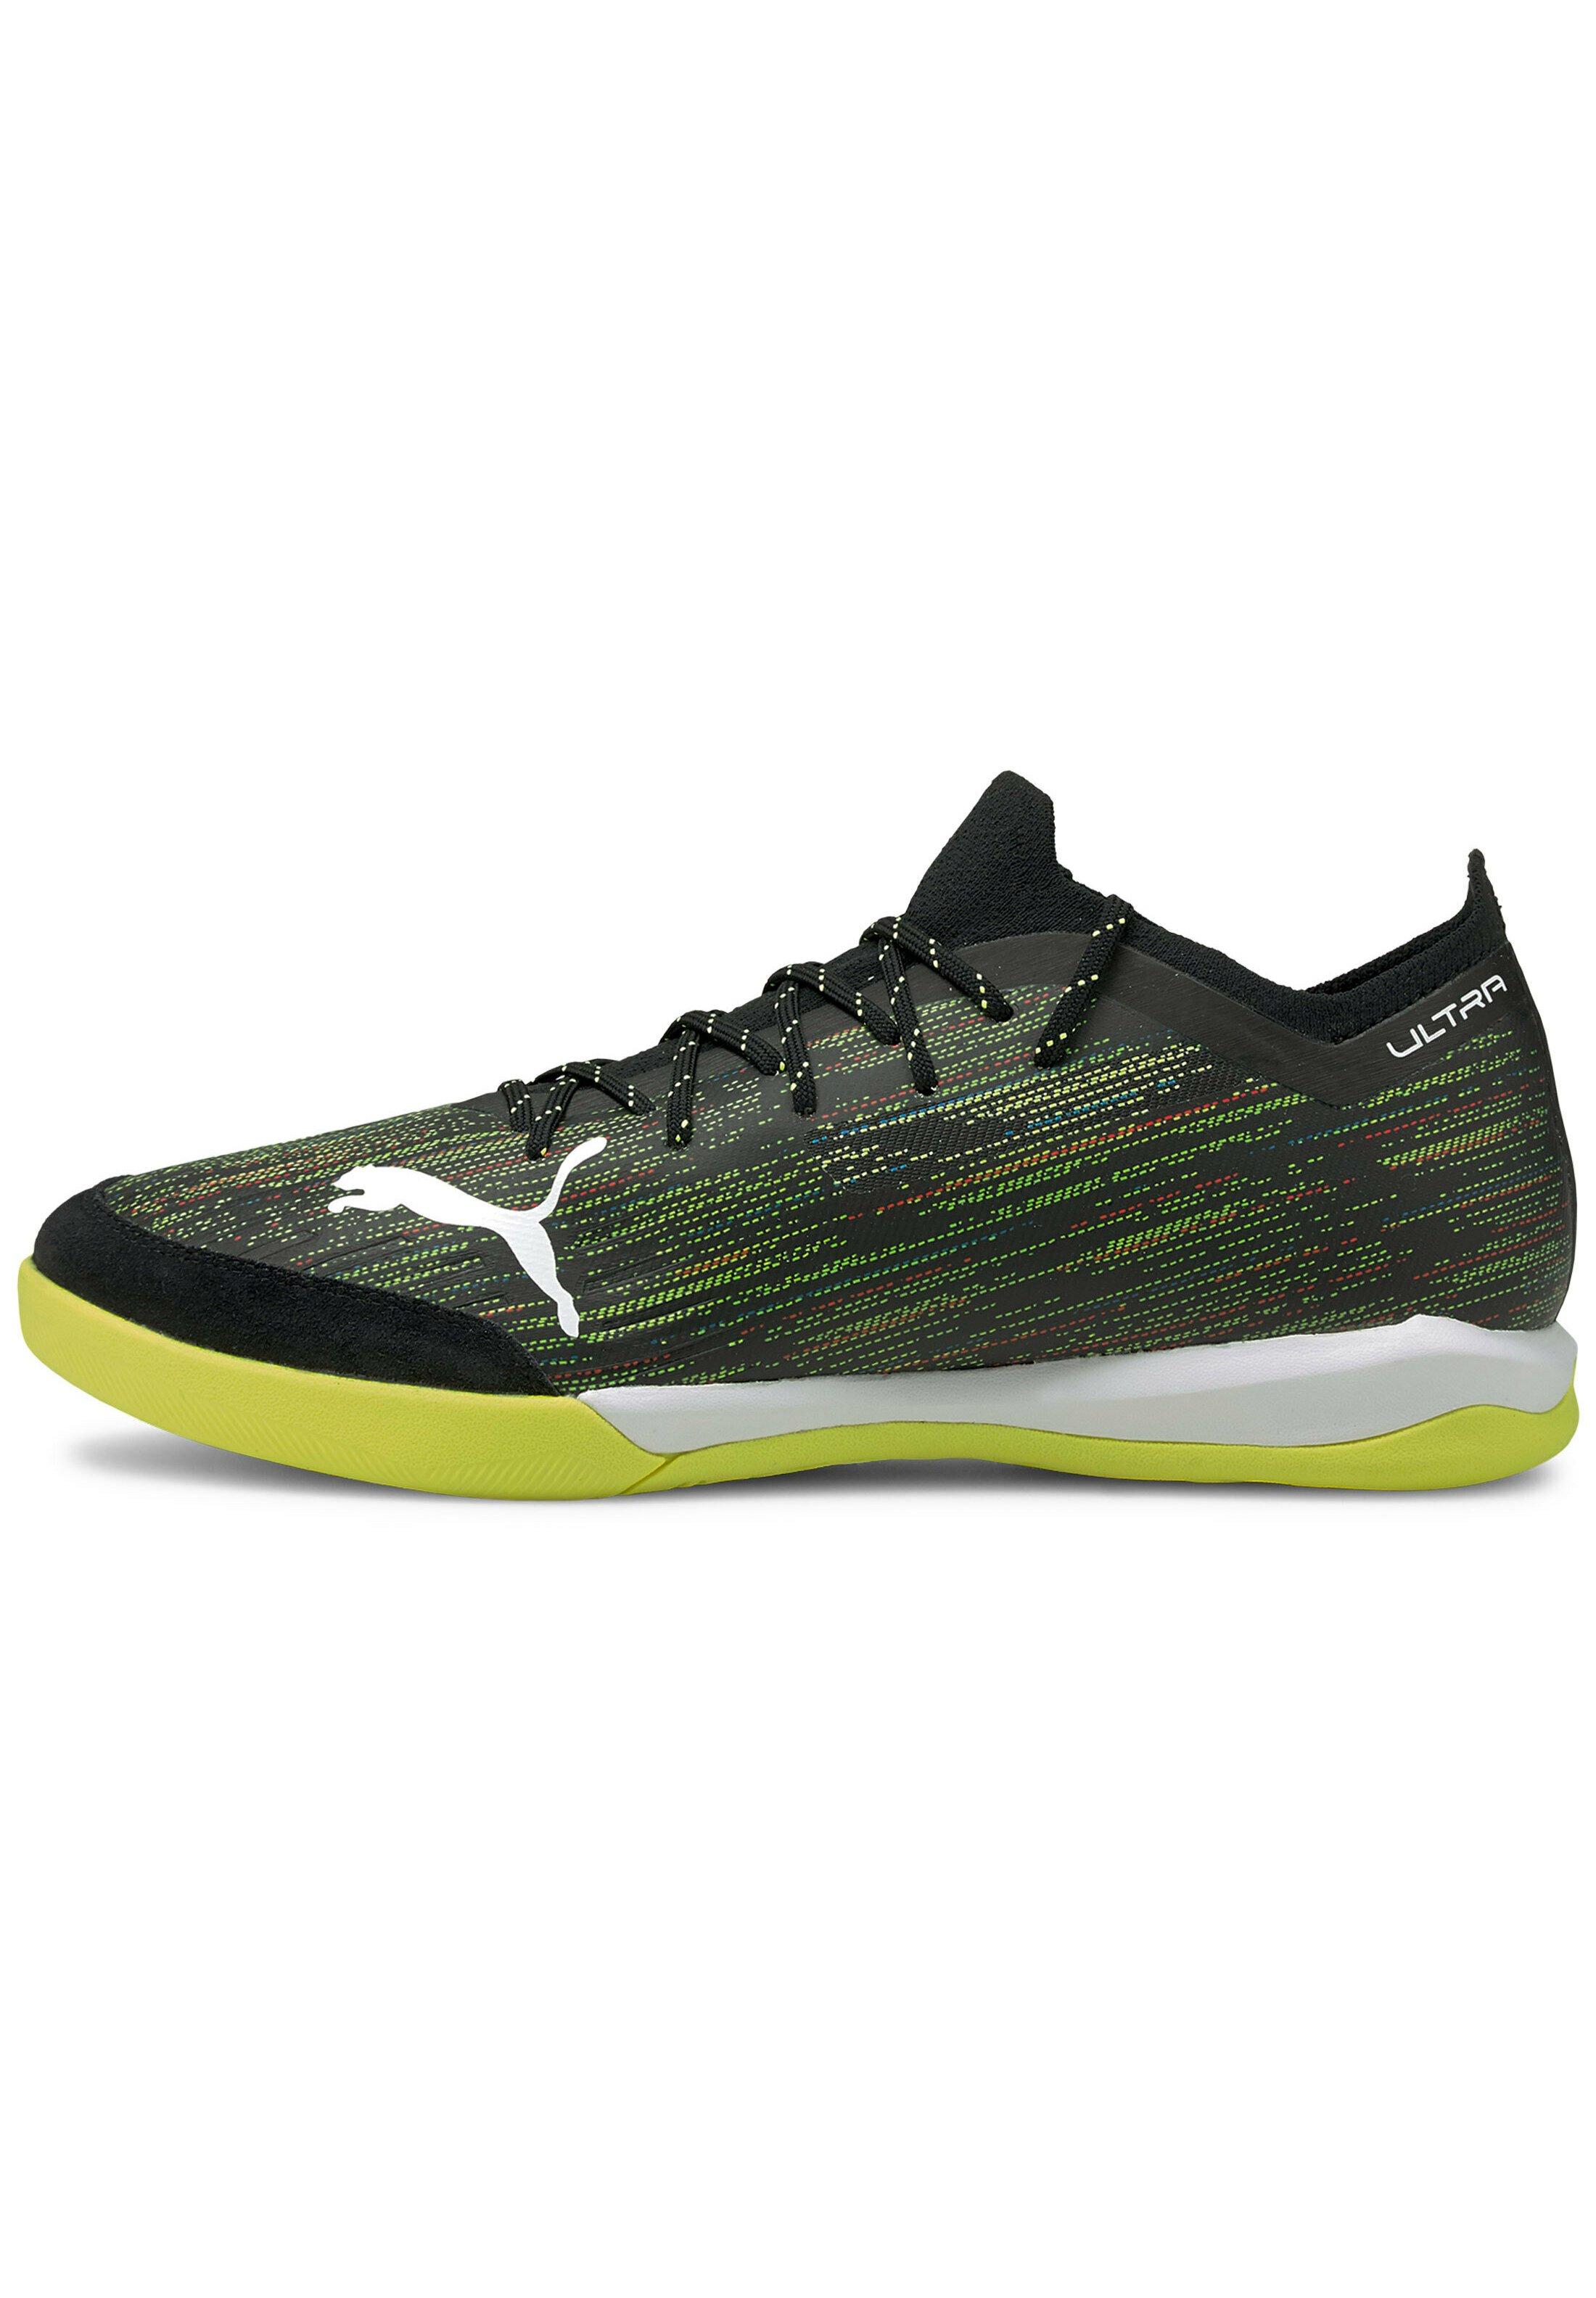 Homme ULTRA 1.2 PRO COURT - Chaussures de foot en salle